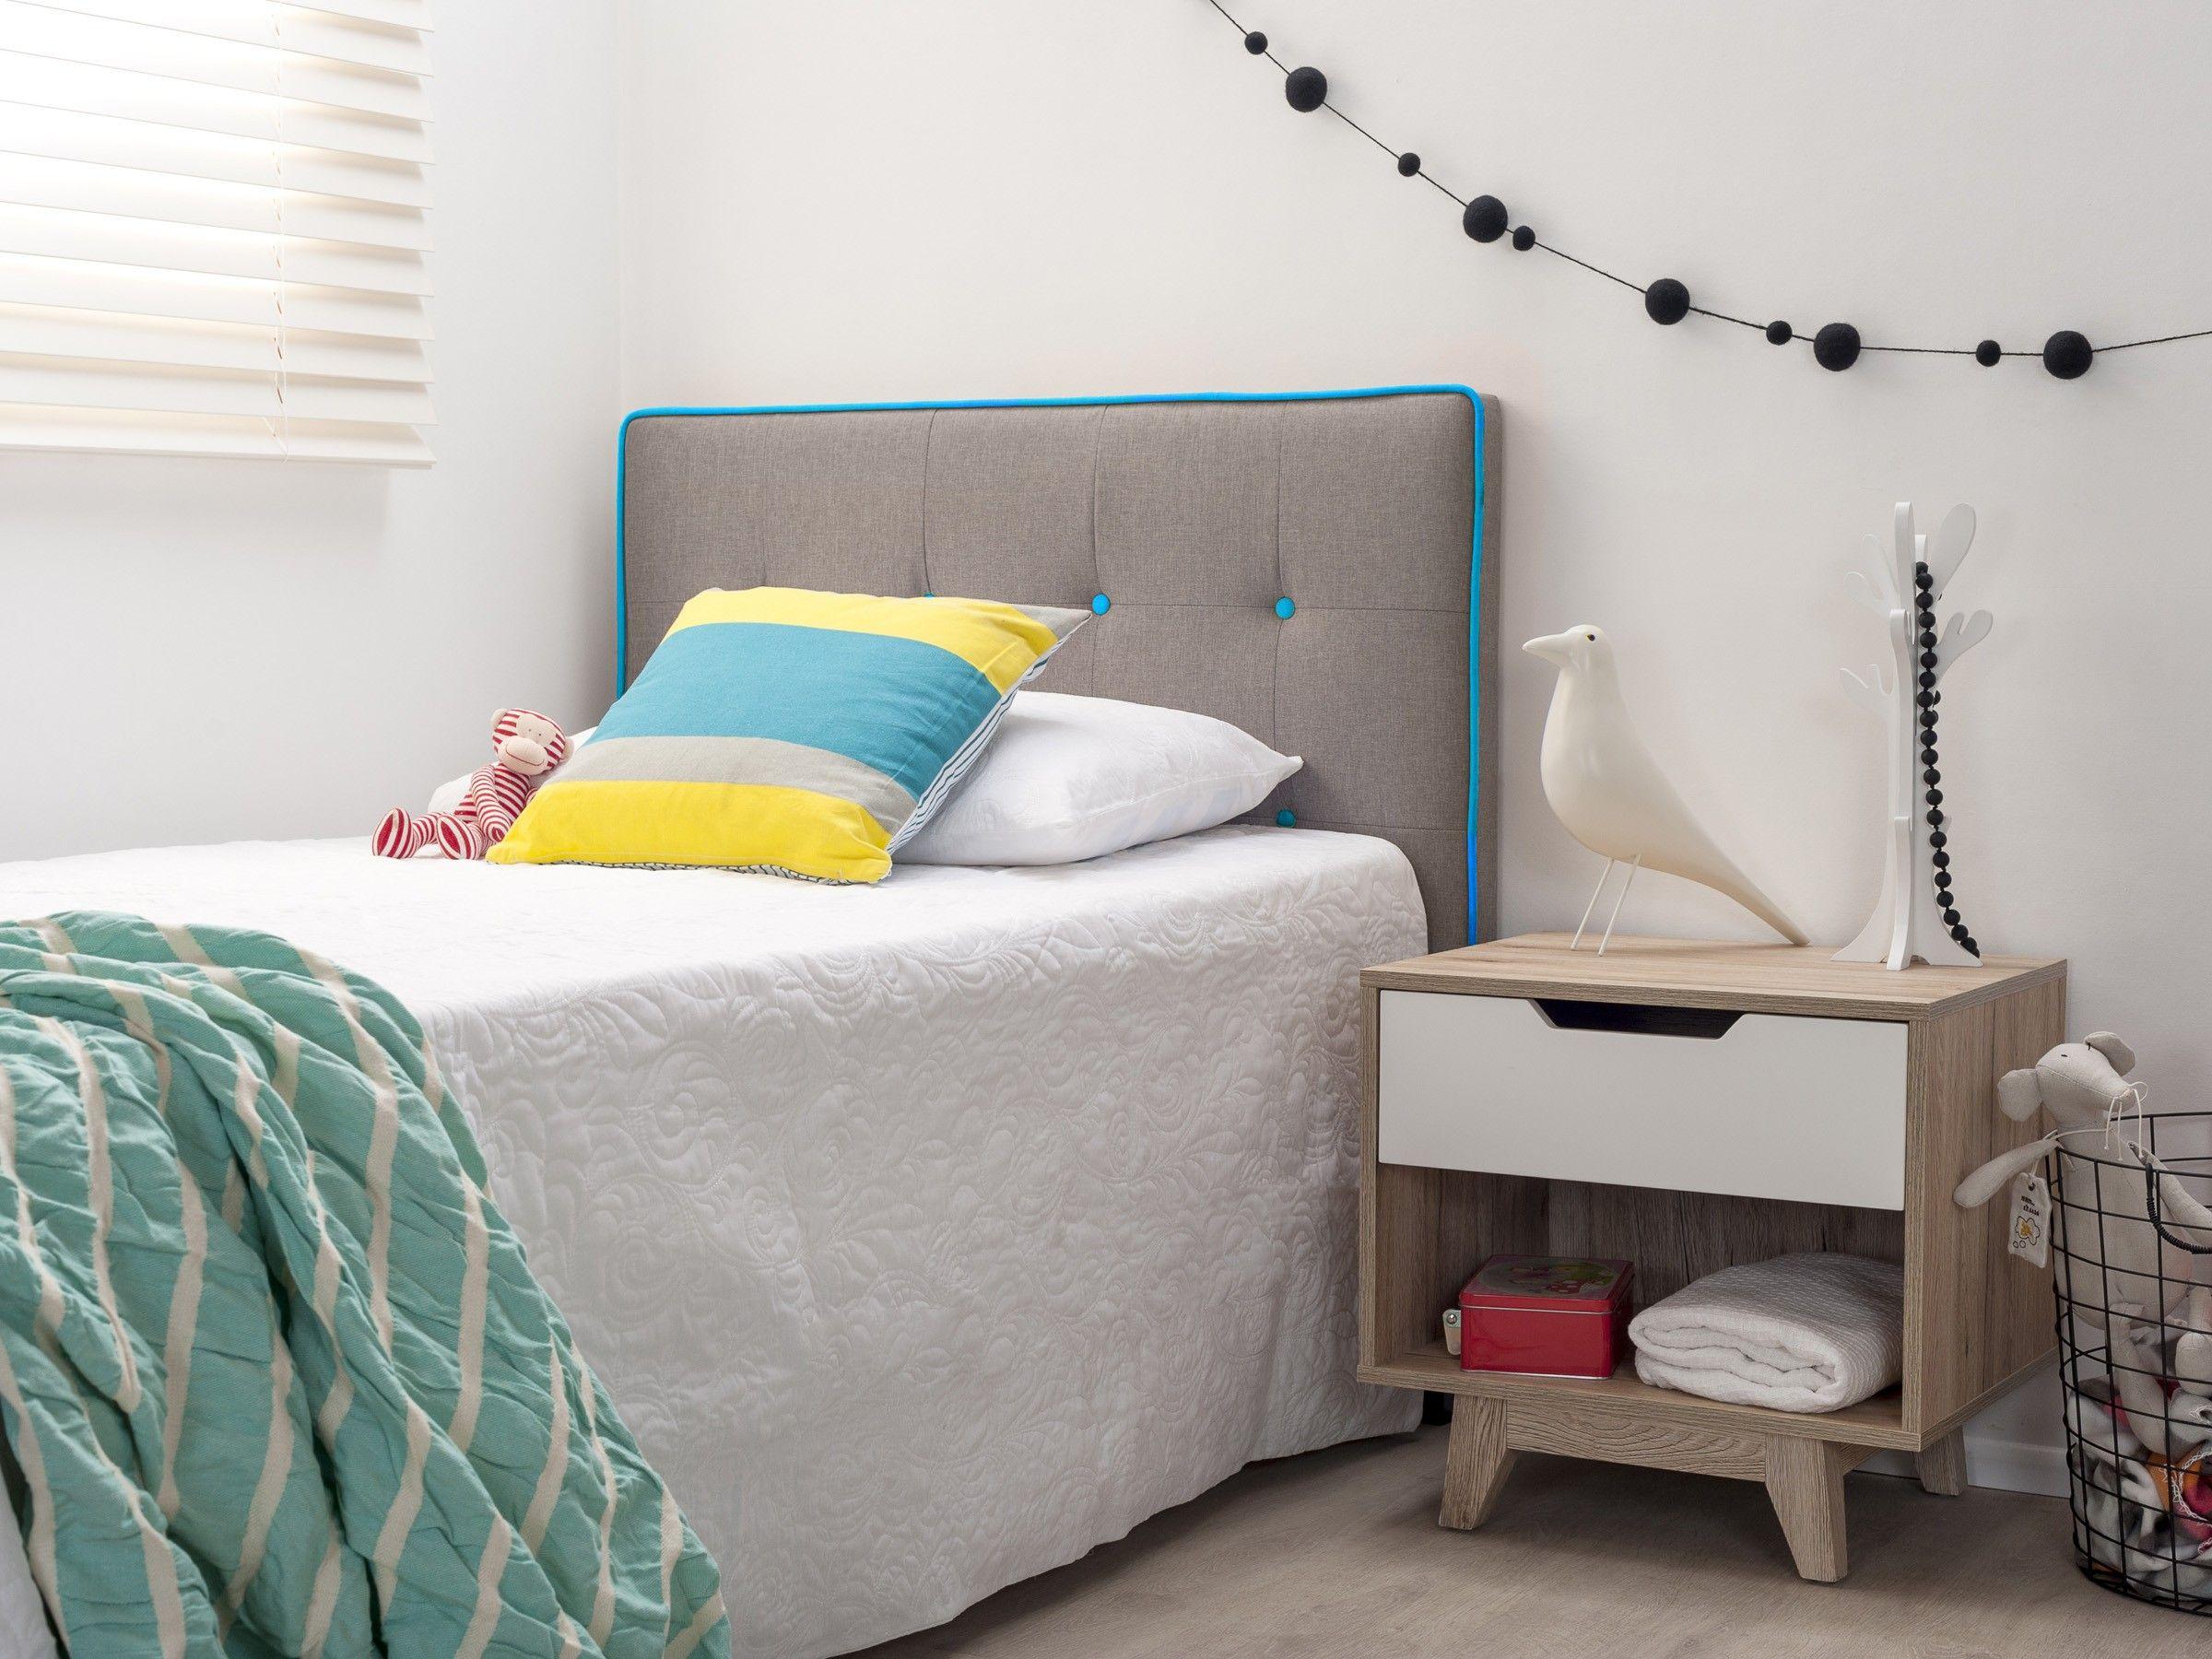 42+ Bedroom table mocka uk formasi cpns